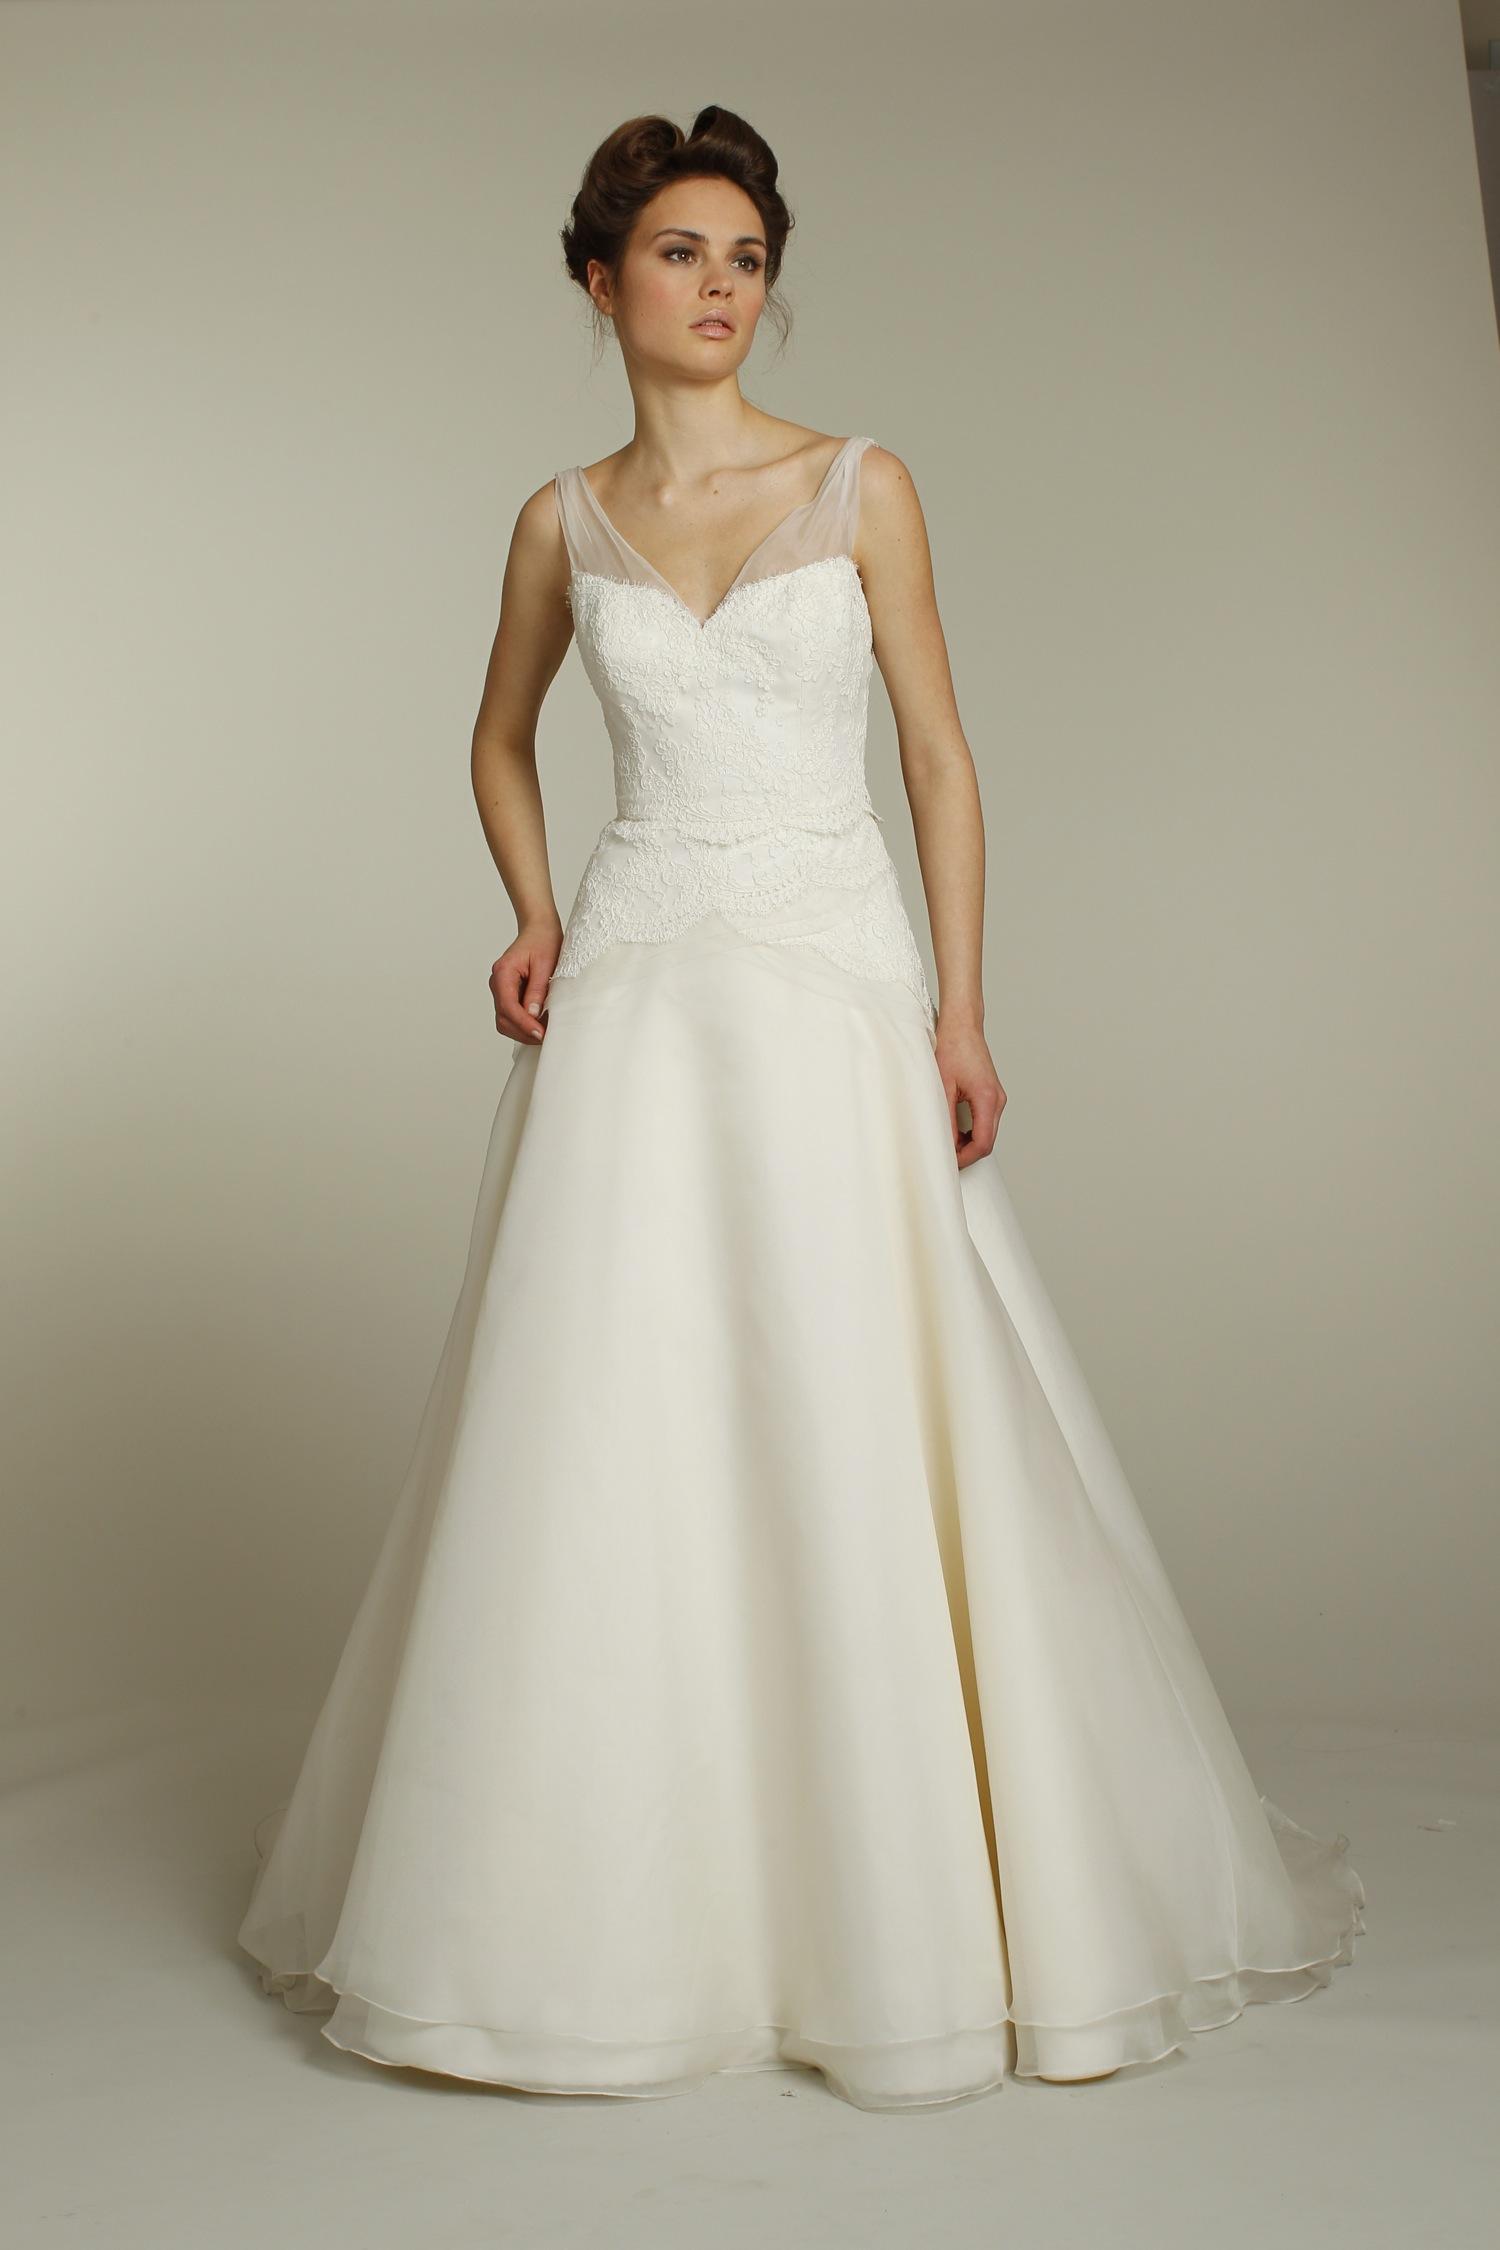 straps for wedding dress uk wedding dress with straps Organza A Line One Shoulder Strap Neckline Wedding Dress Uk